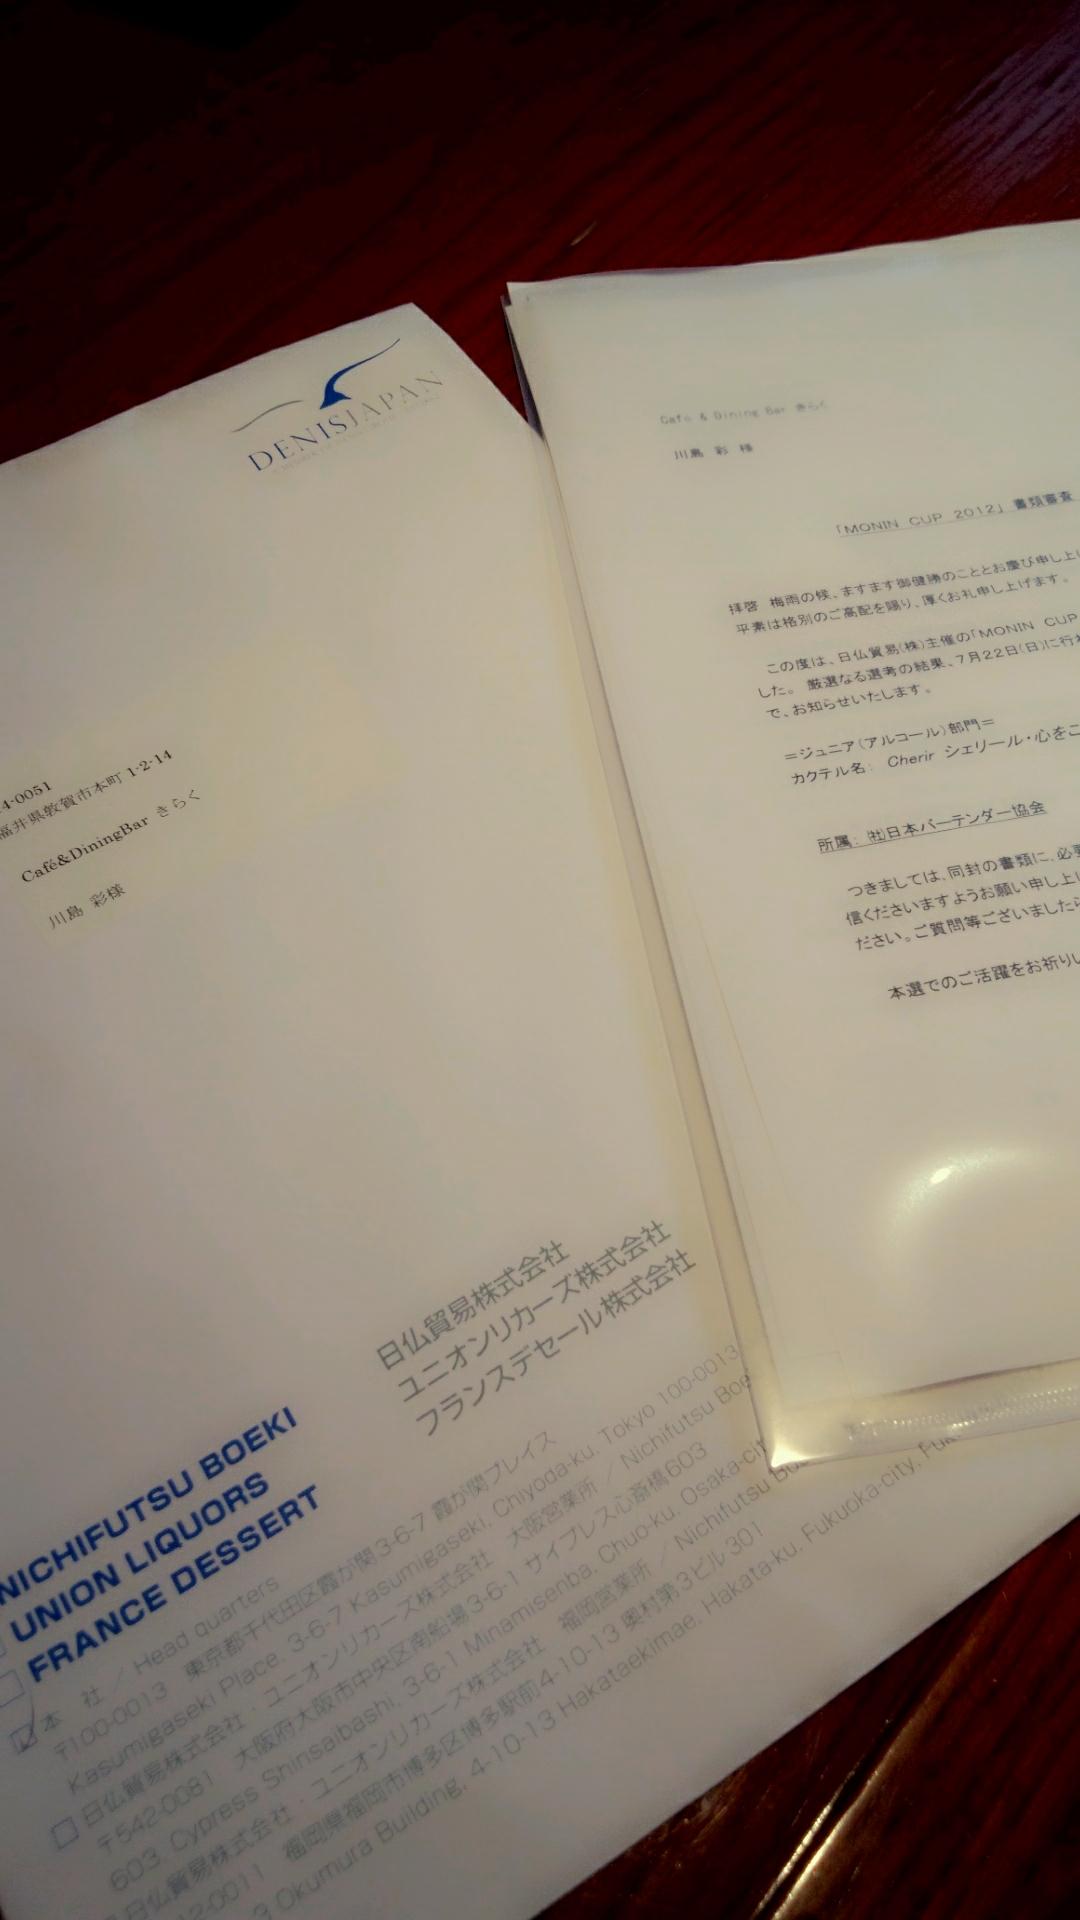 C360_2012-06-25-11-53-17.jpg